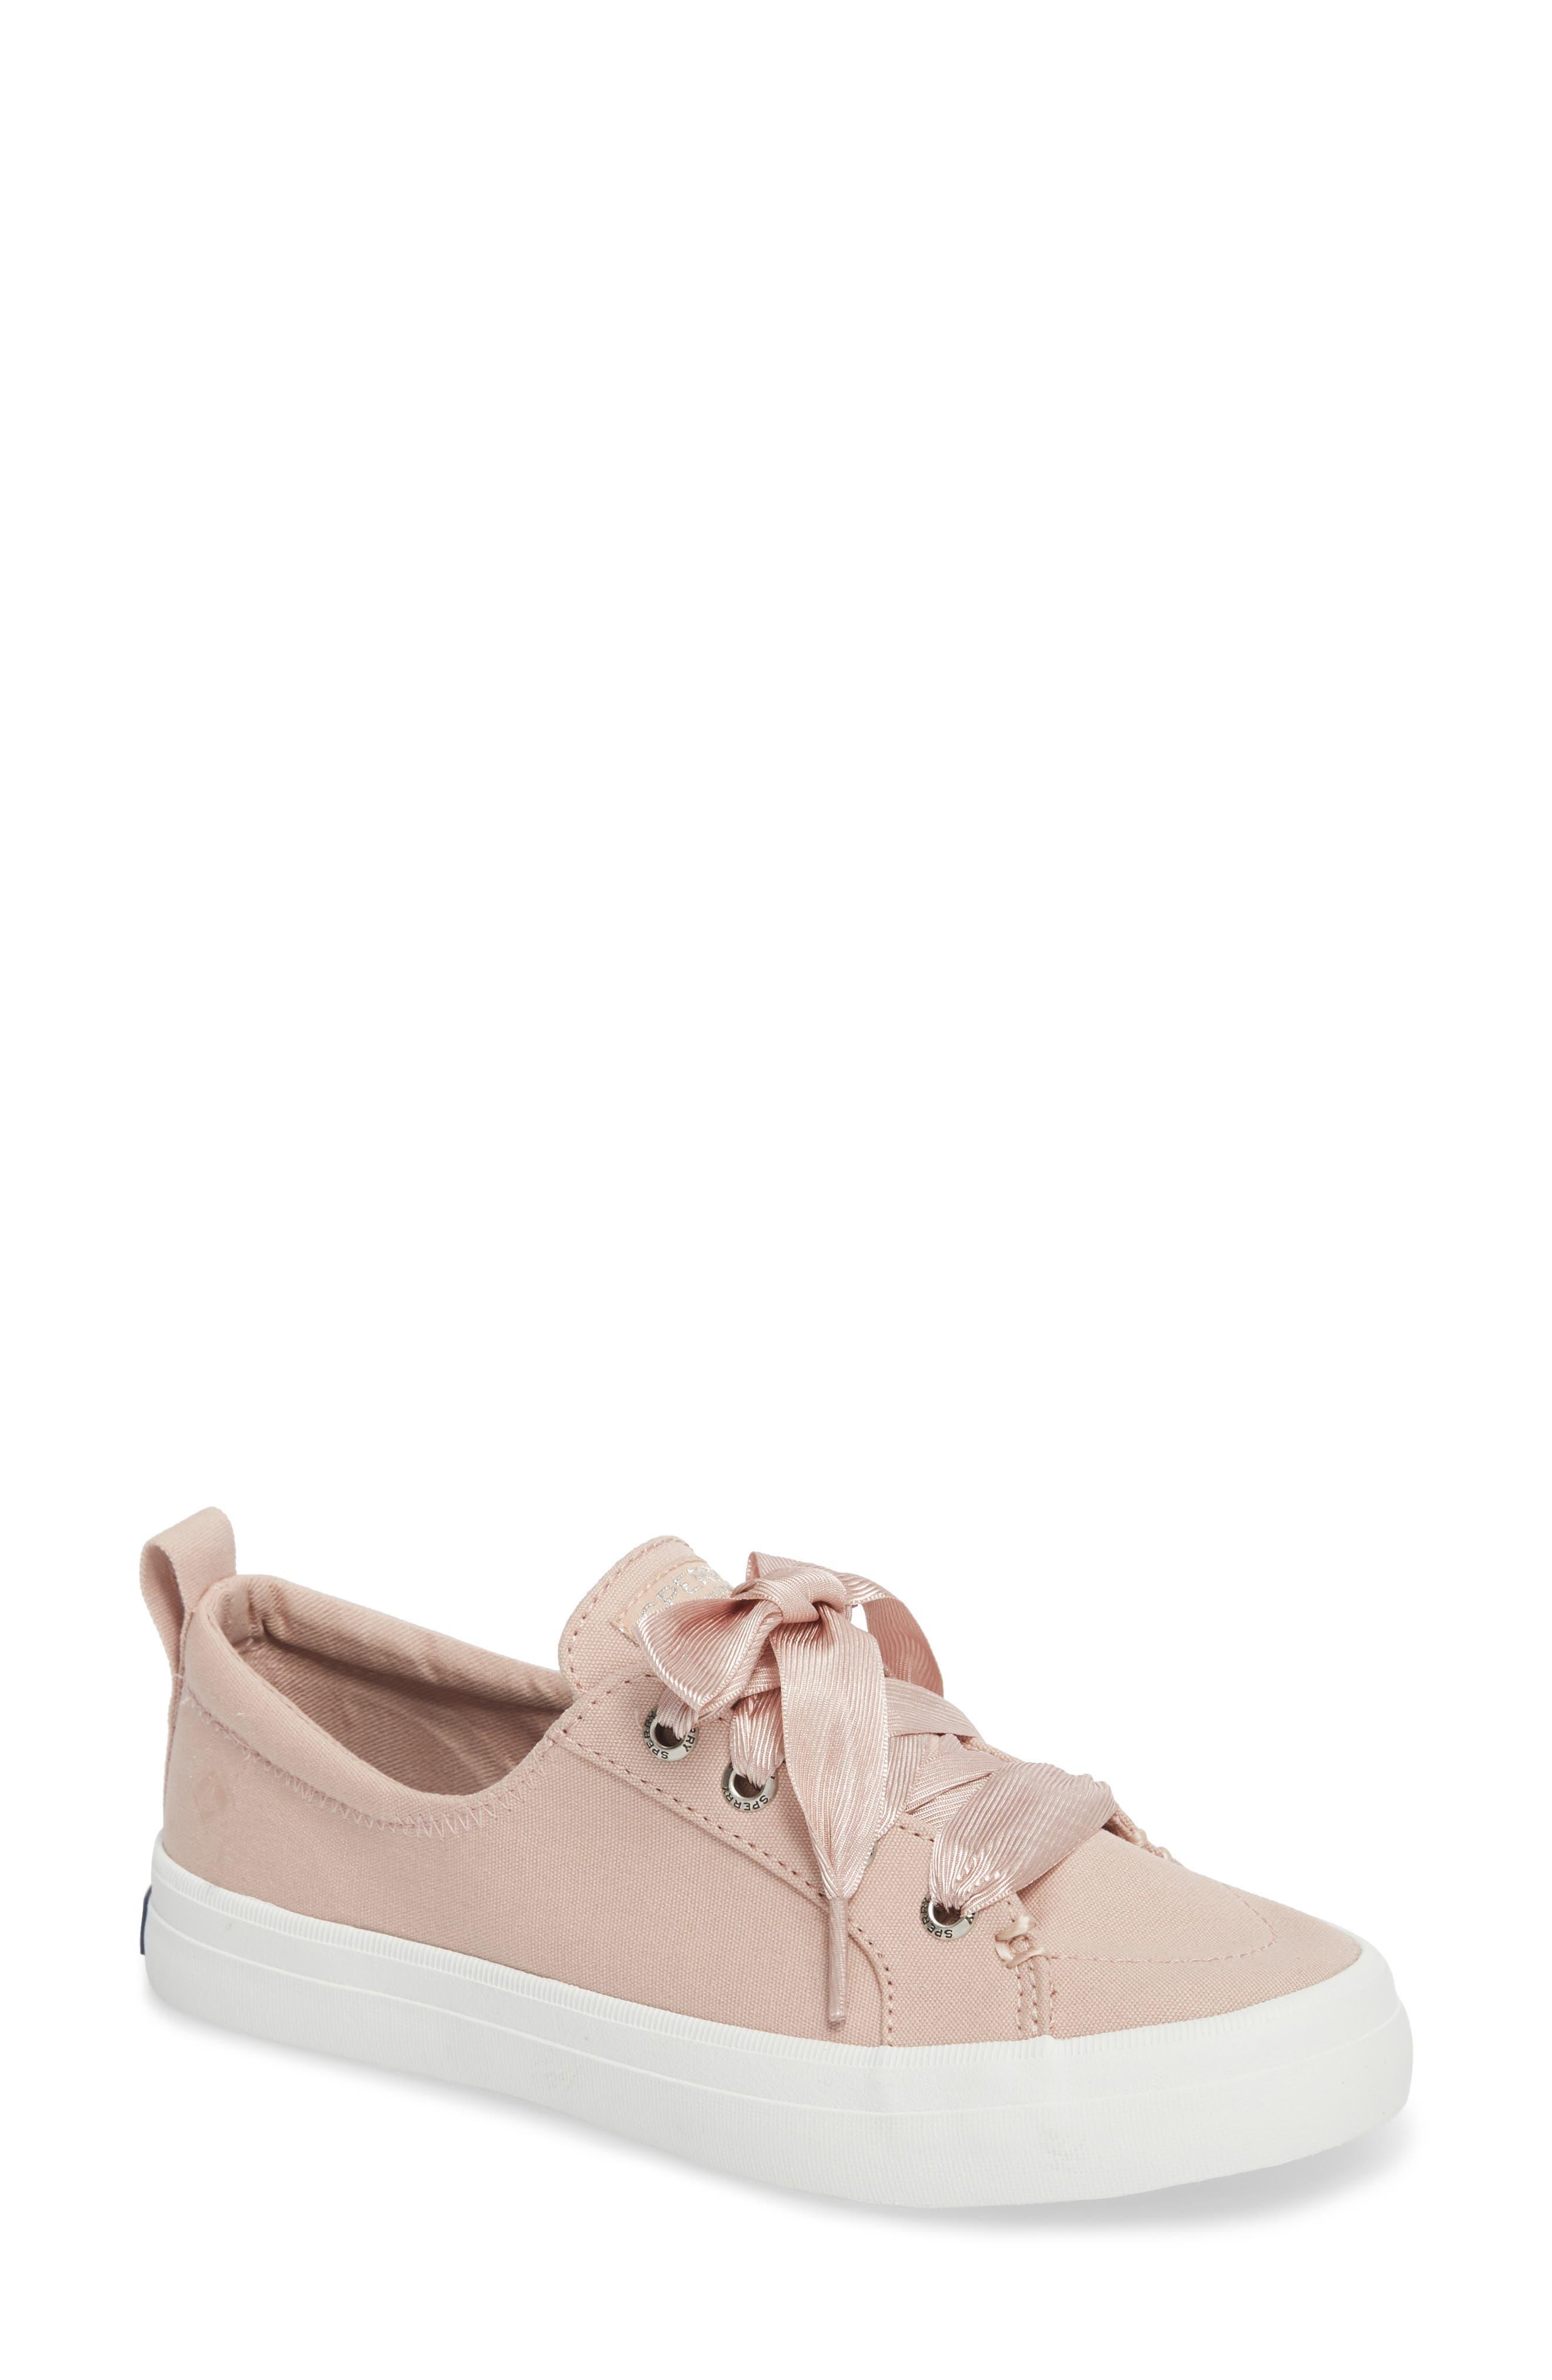 Crest Vibe Satin Lace Sneaker,                         Main,                         color, Rose Dust Canvas